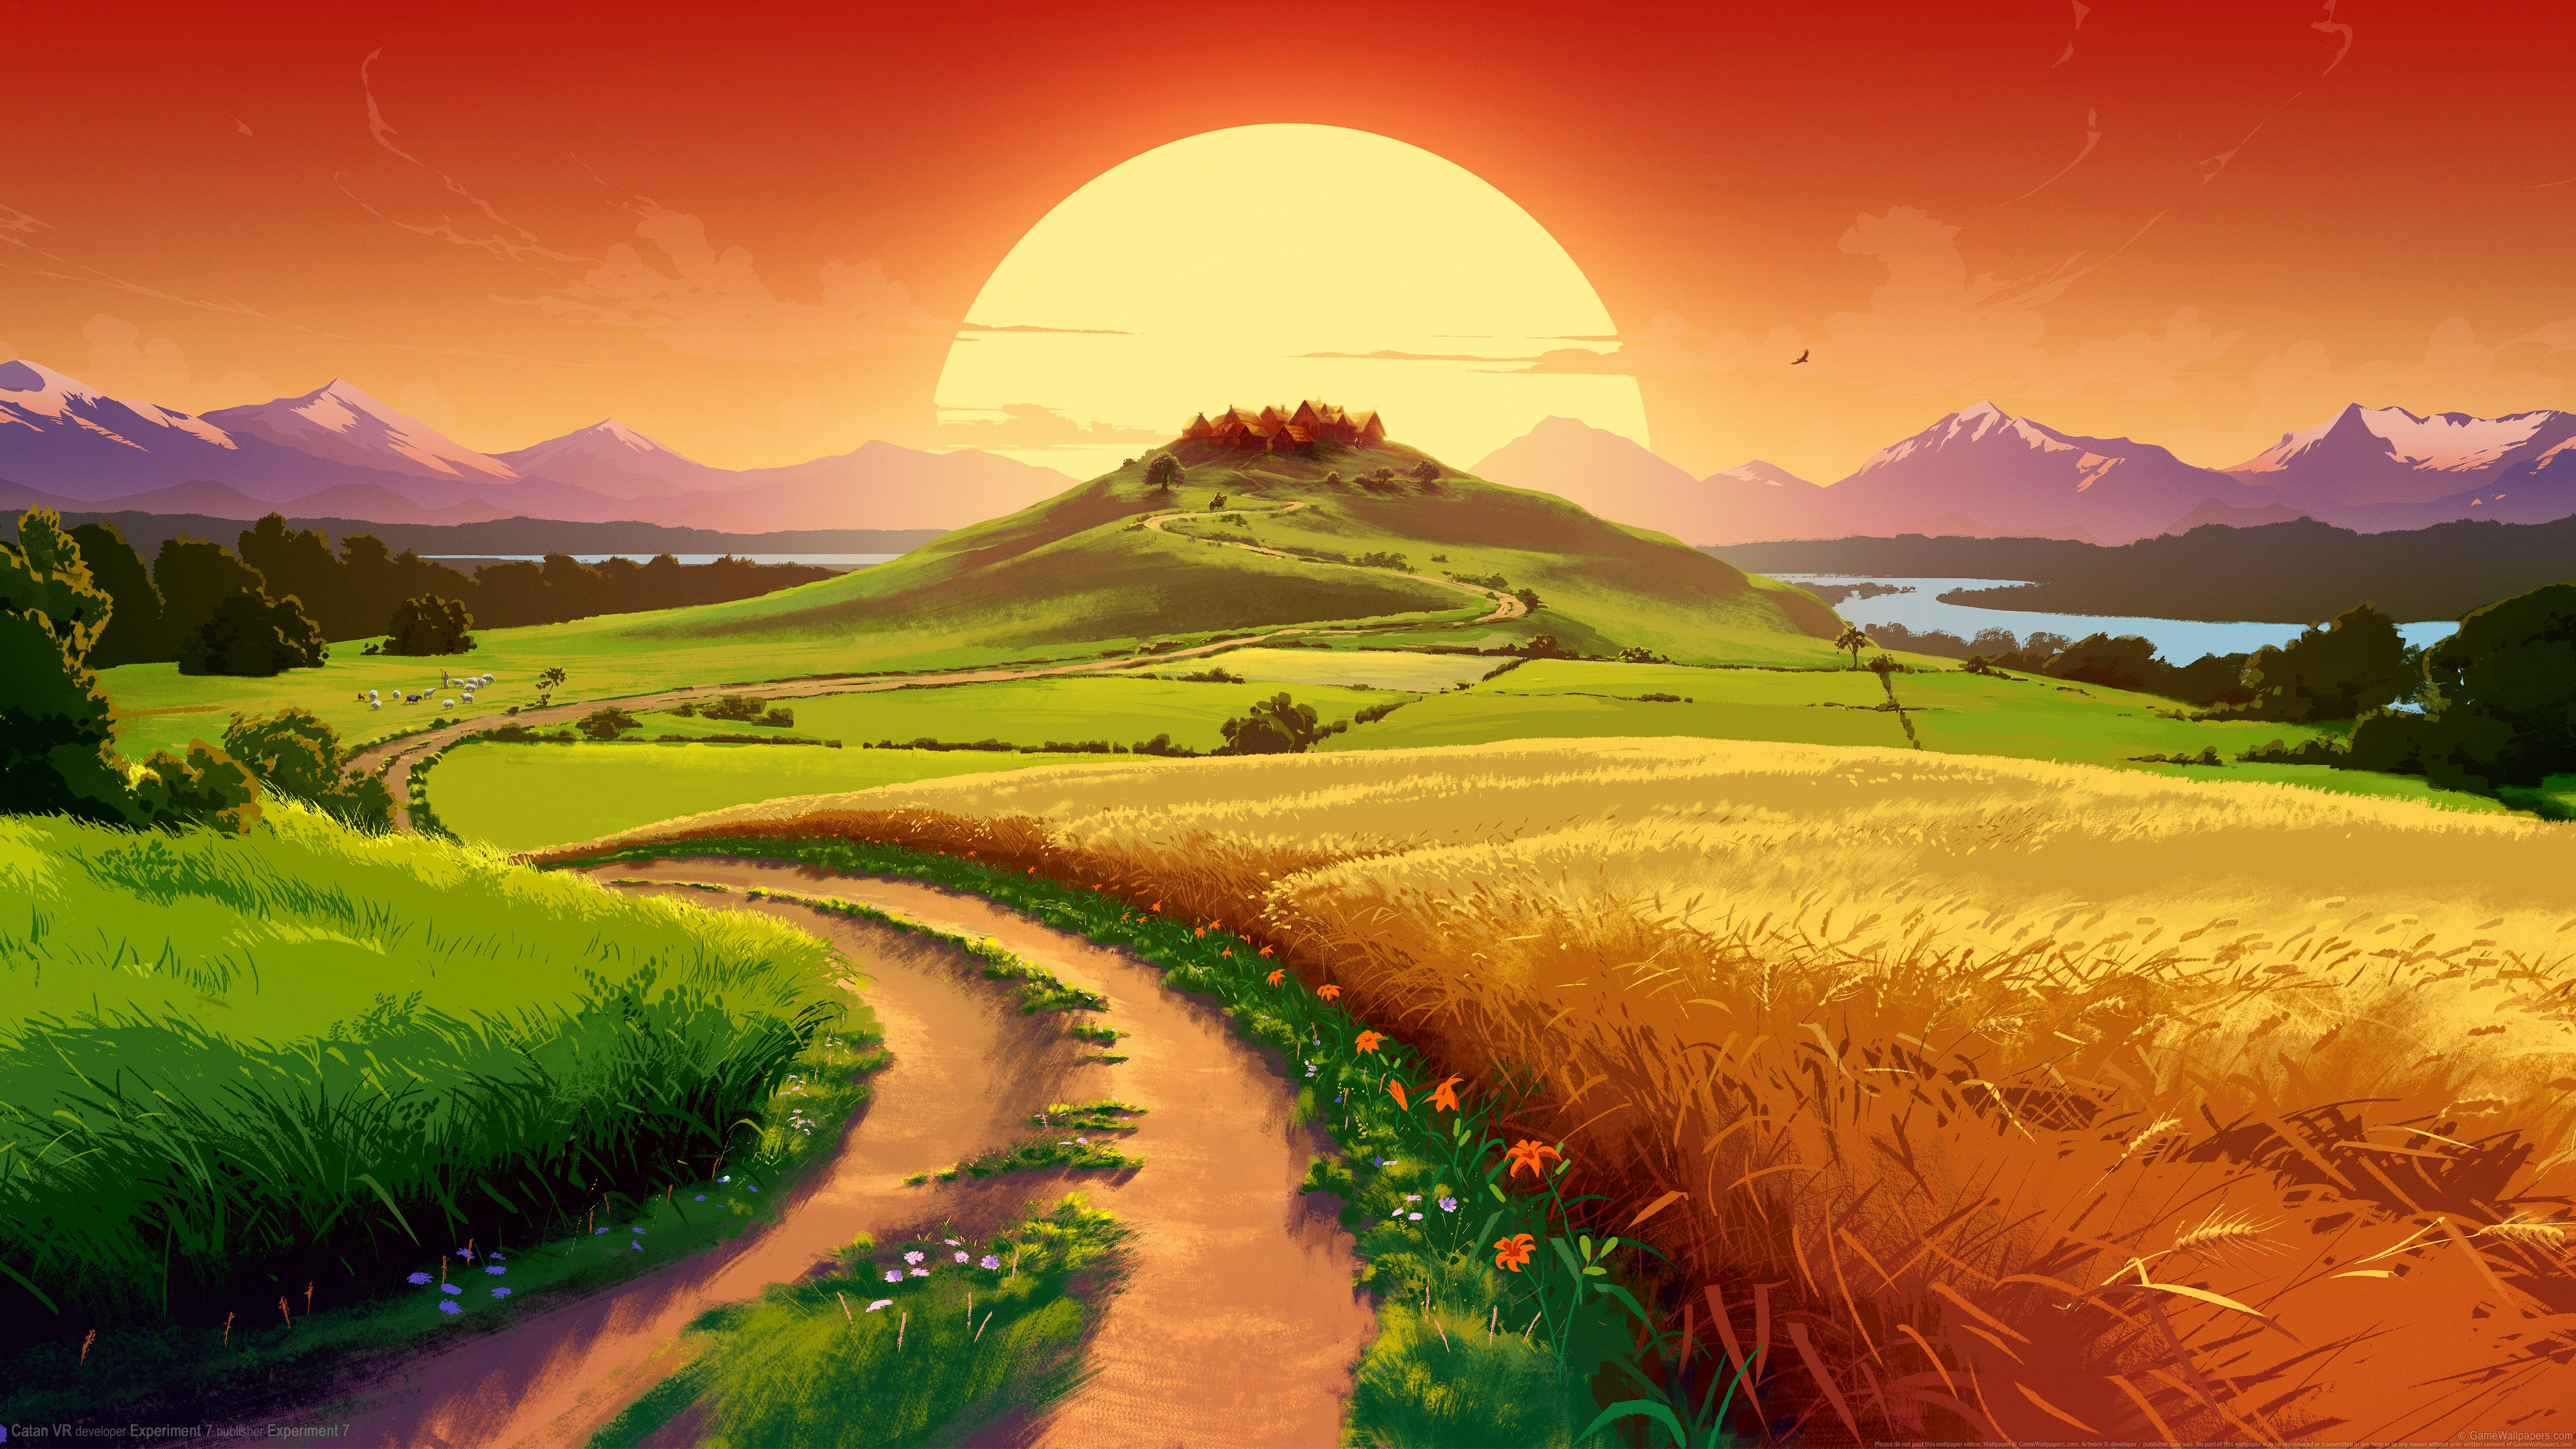 General 5120x2880 video games digital art field landscape grass Sun sky river mountains colorful fantasy art catan